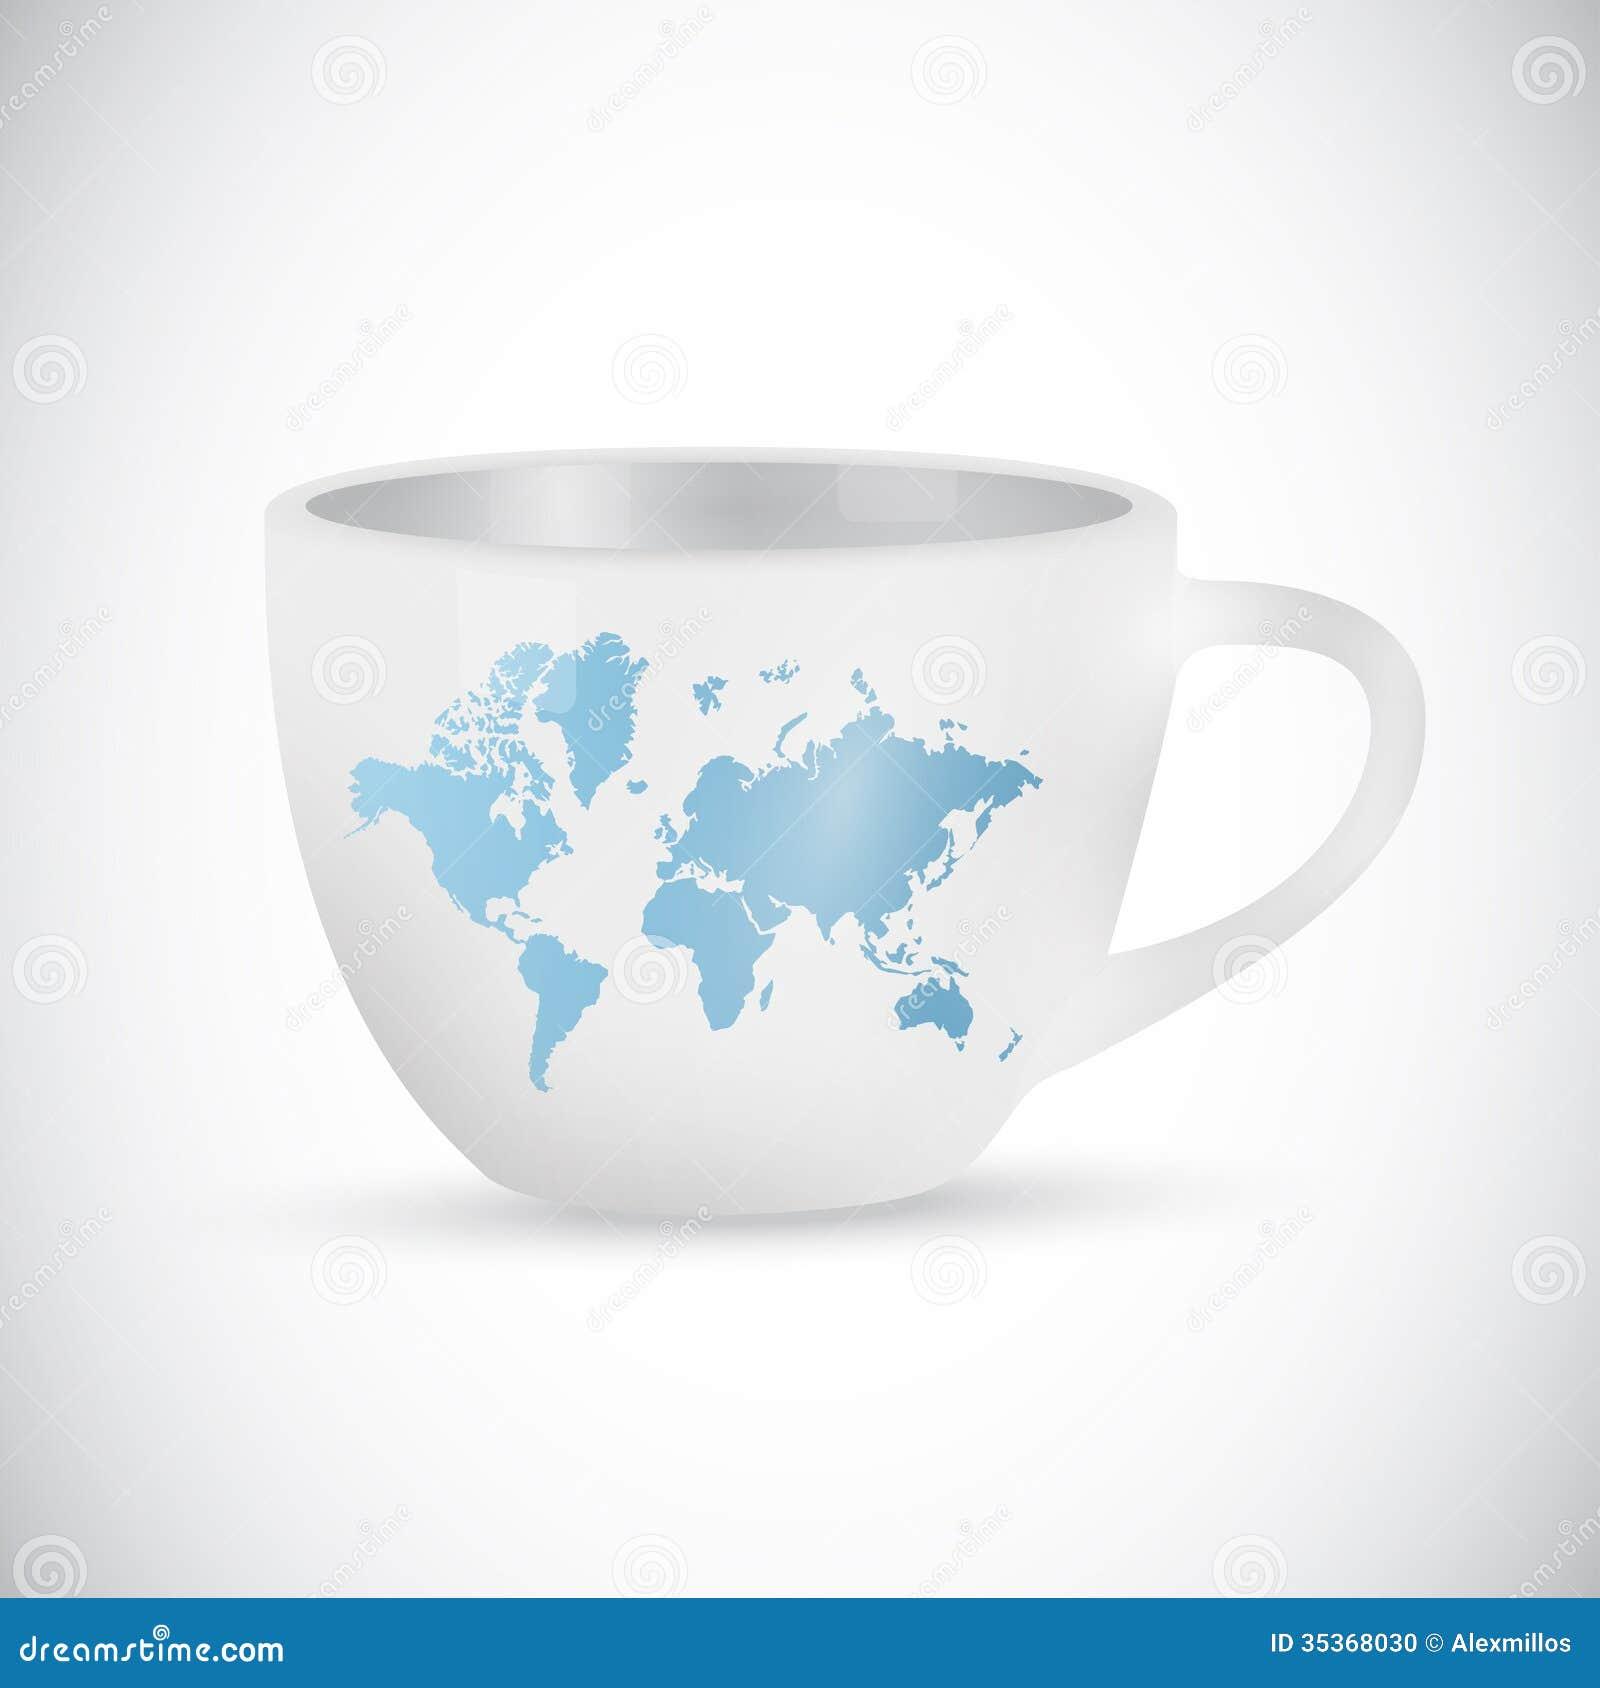 World map coffee mug illustration design stock illustration download world map coffee mug illustration design stock illustration illustration of food ceramic gumiabroncs Image collections